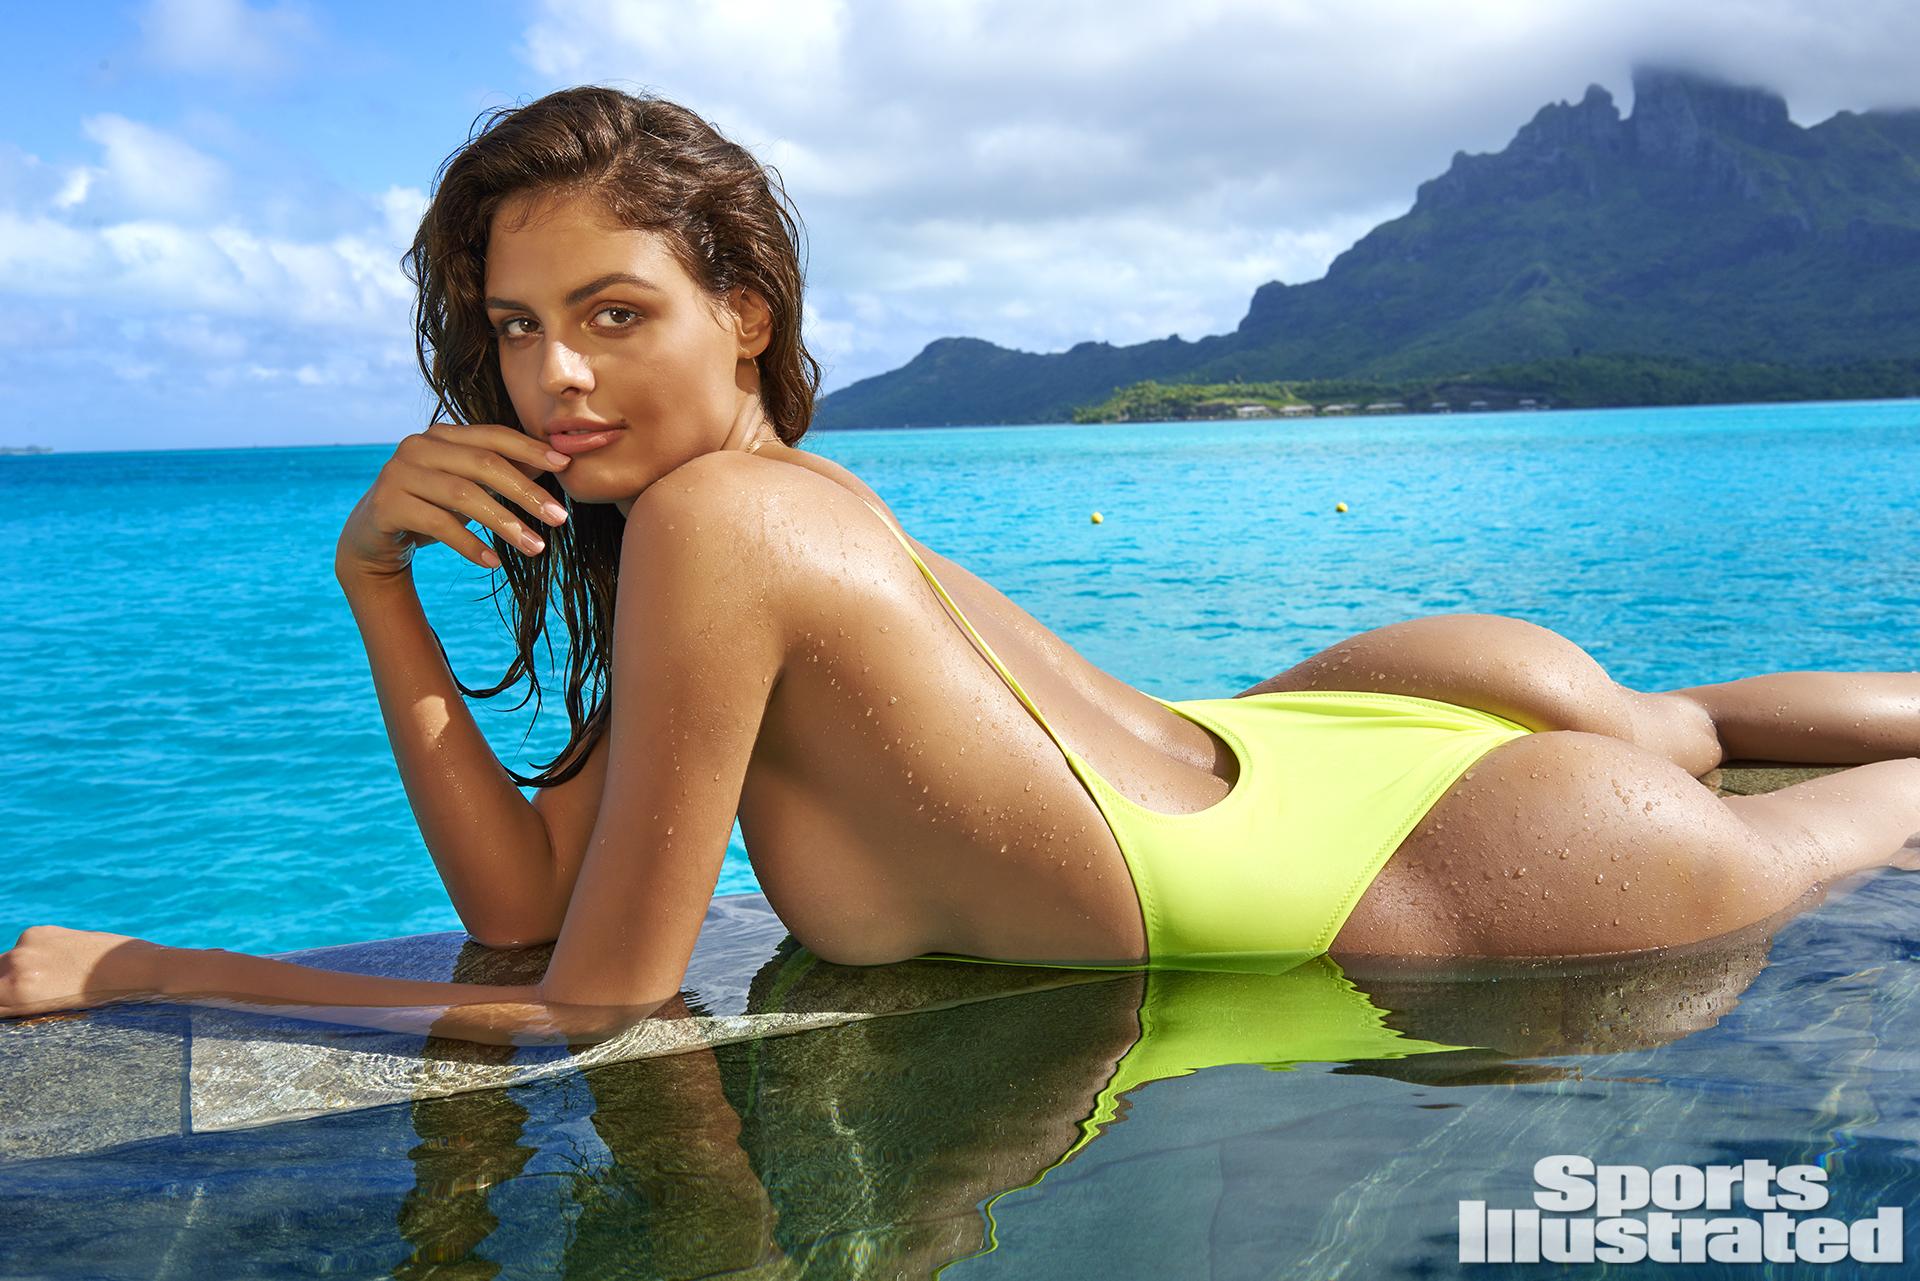 Bo Krsmanovic was photographed by Yu Tsai in The Islands Of Tahiti. Swimsuit by Kai Lani Swimwear.